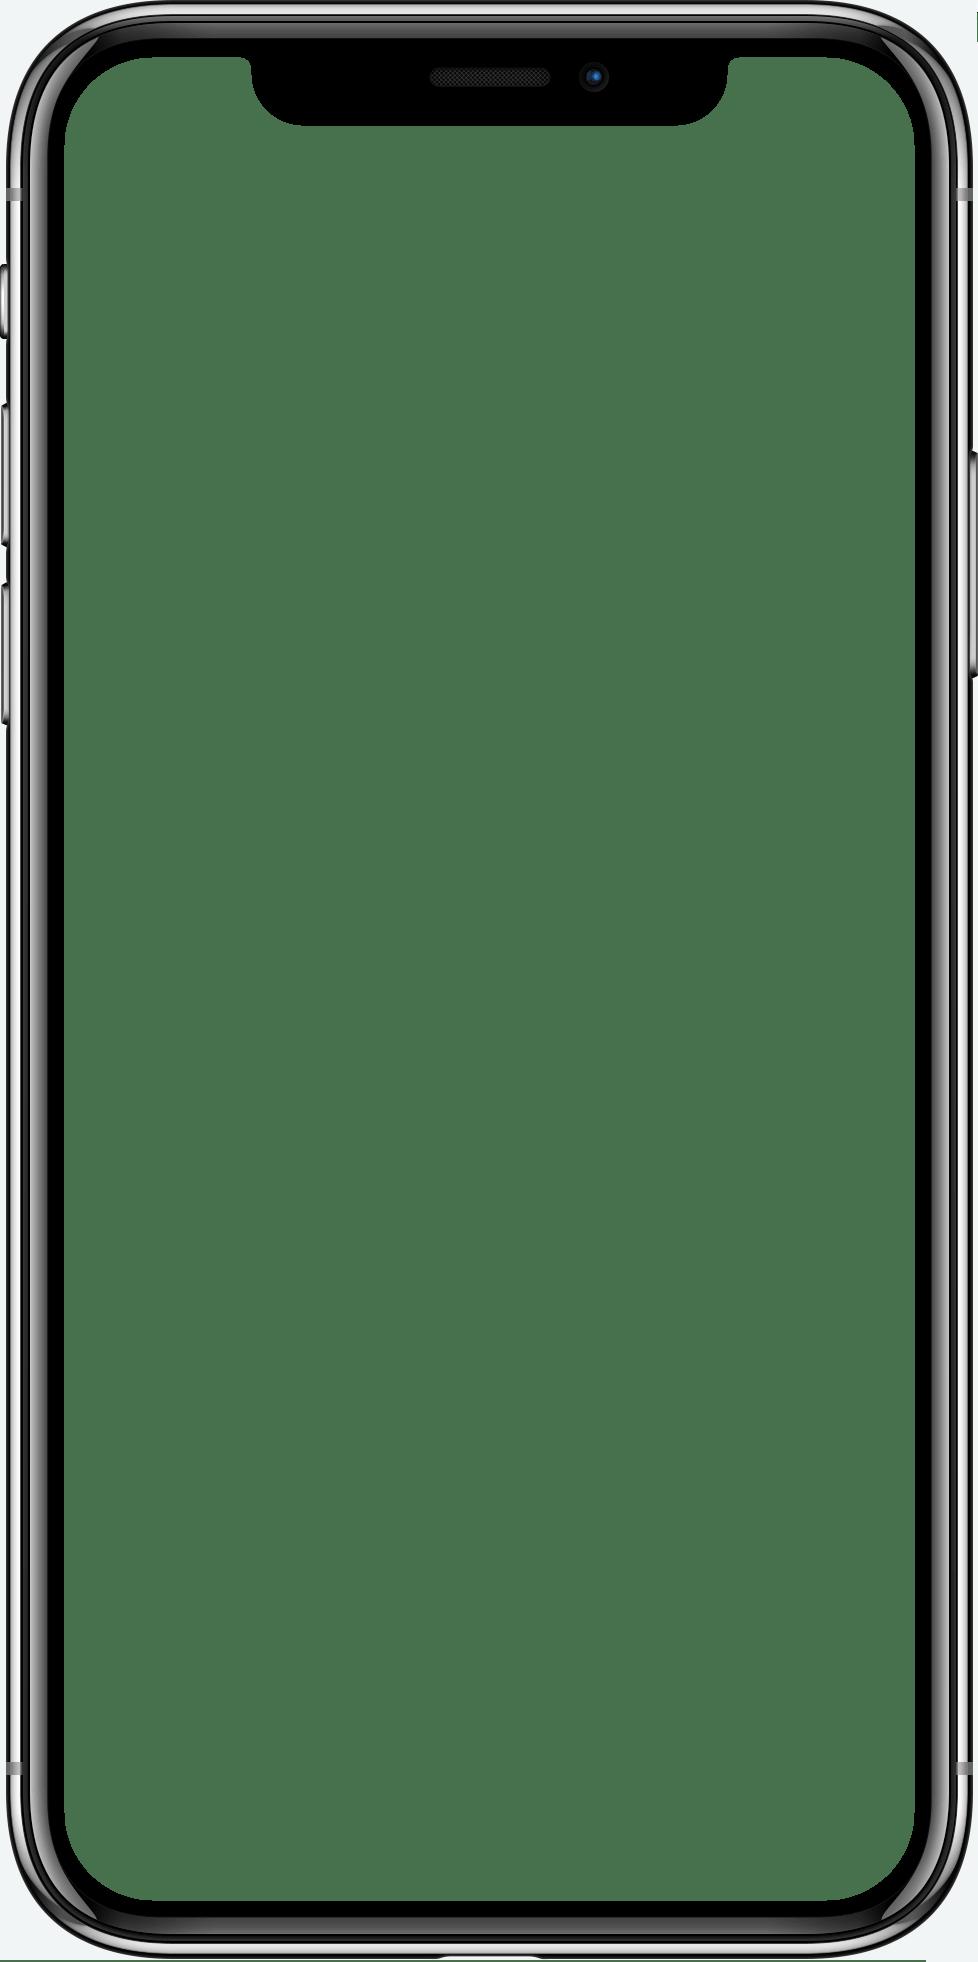 iphonex frame